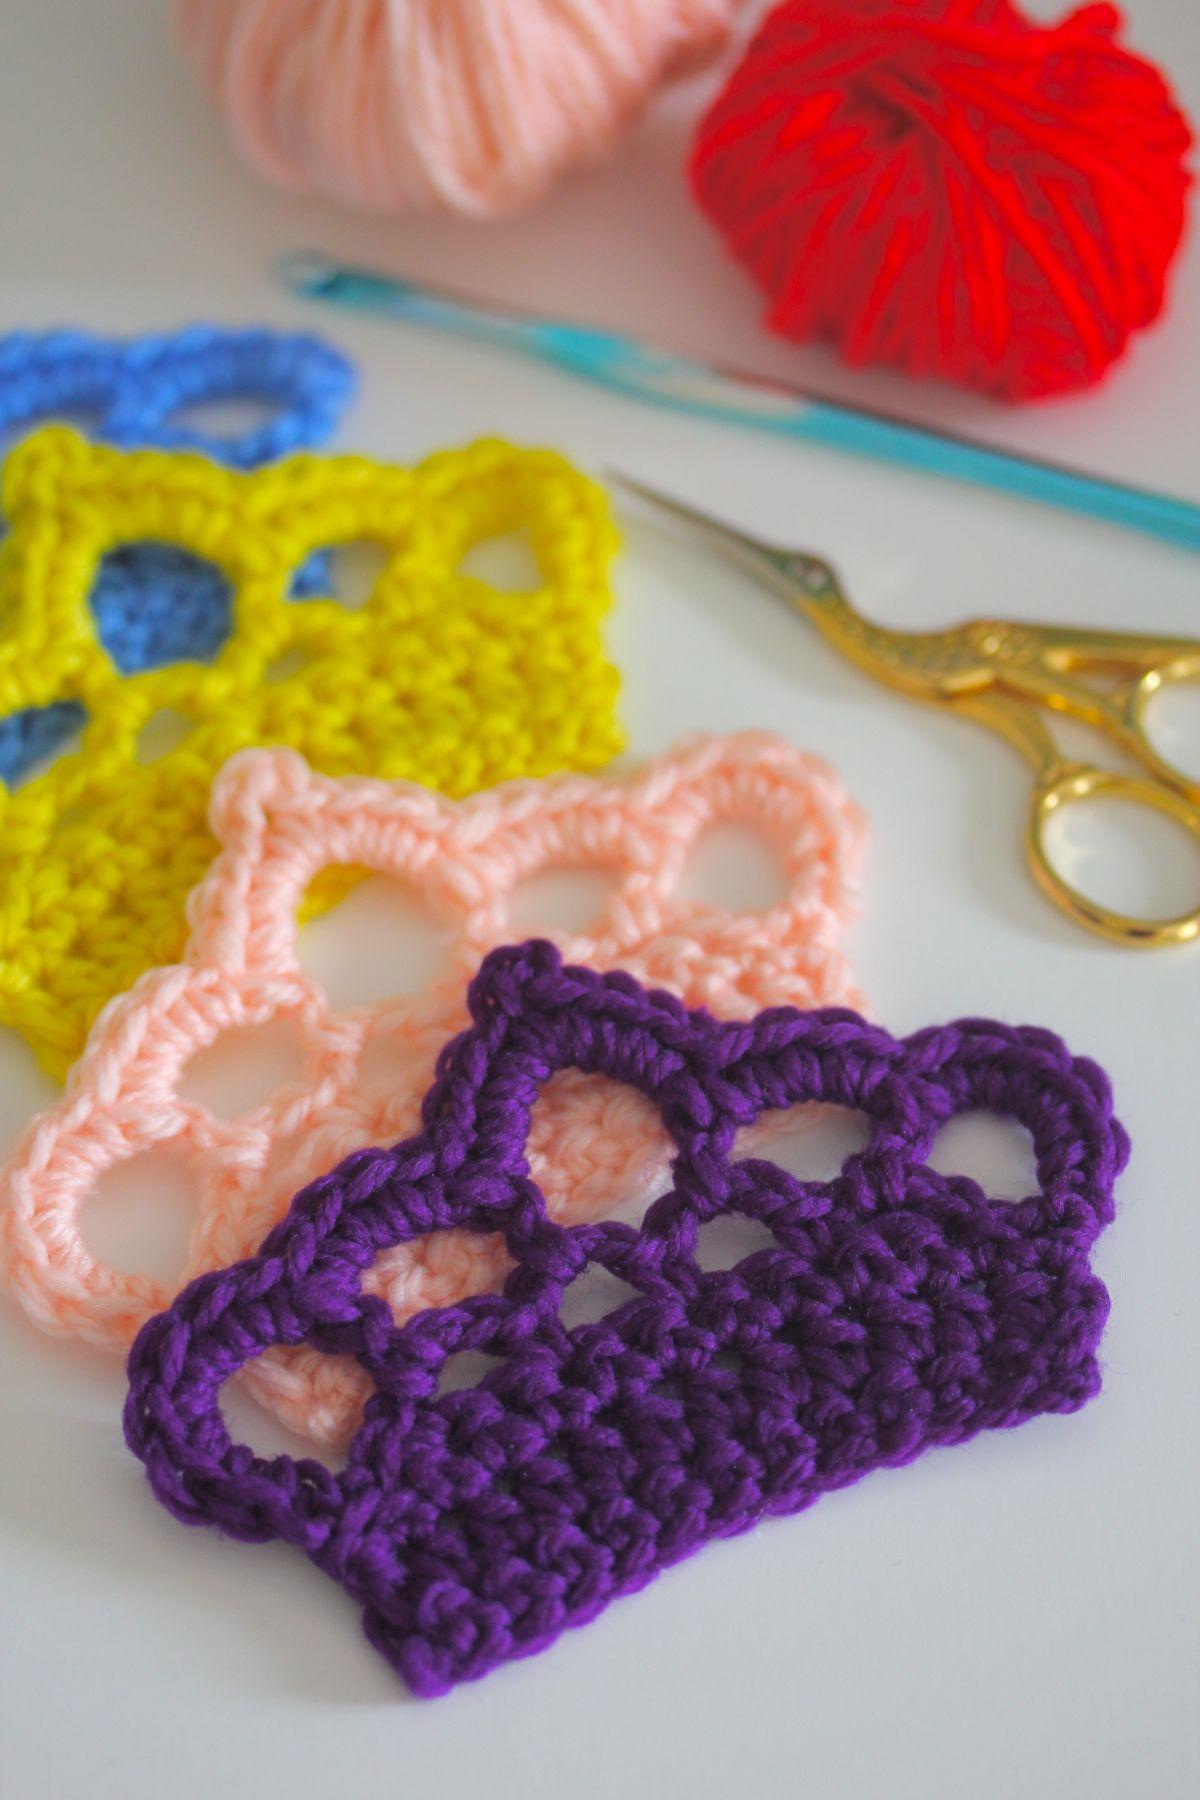 Commemorative Crocheted Crown Kleinigkeiten Little Things